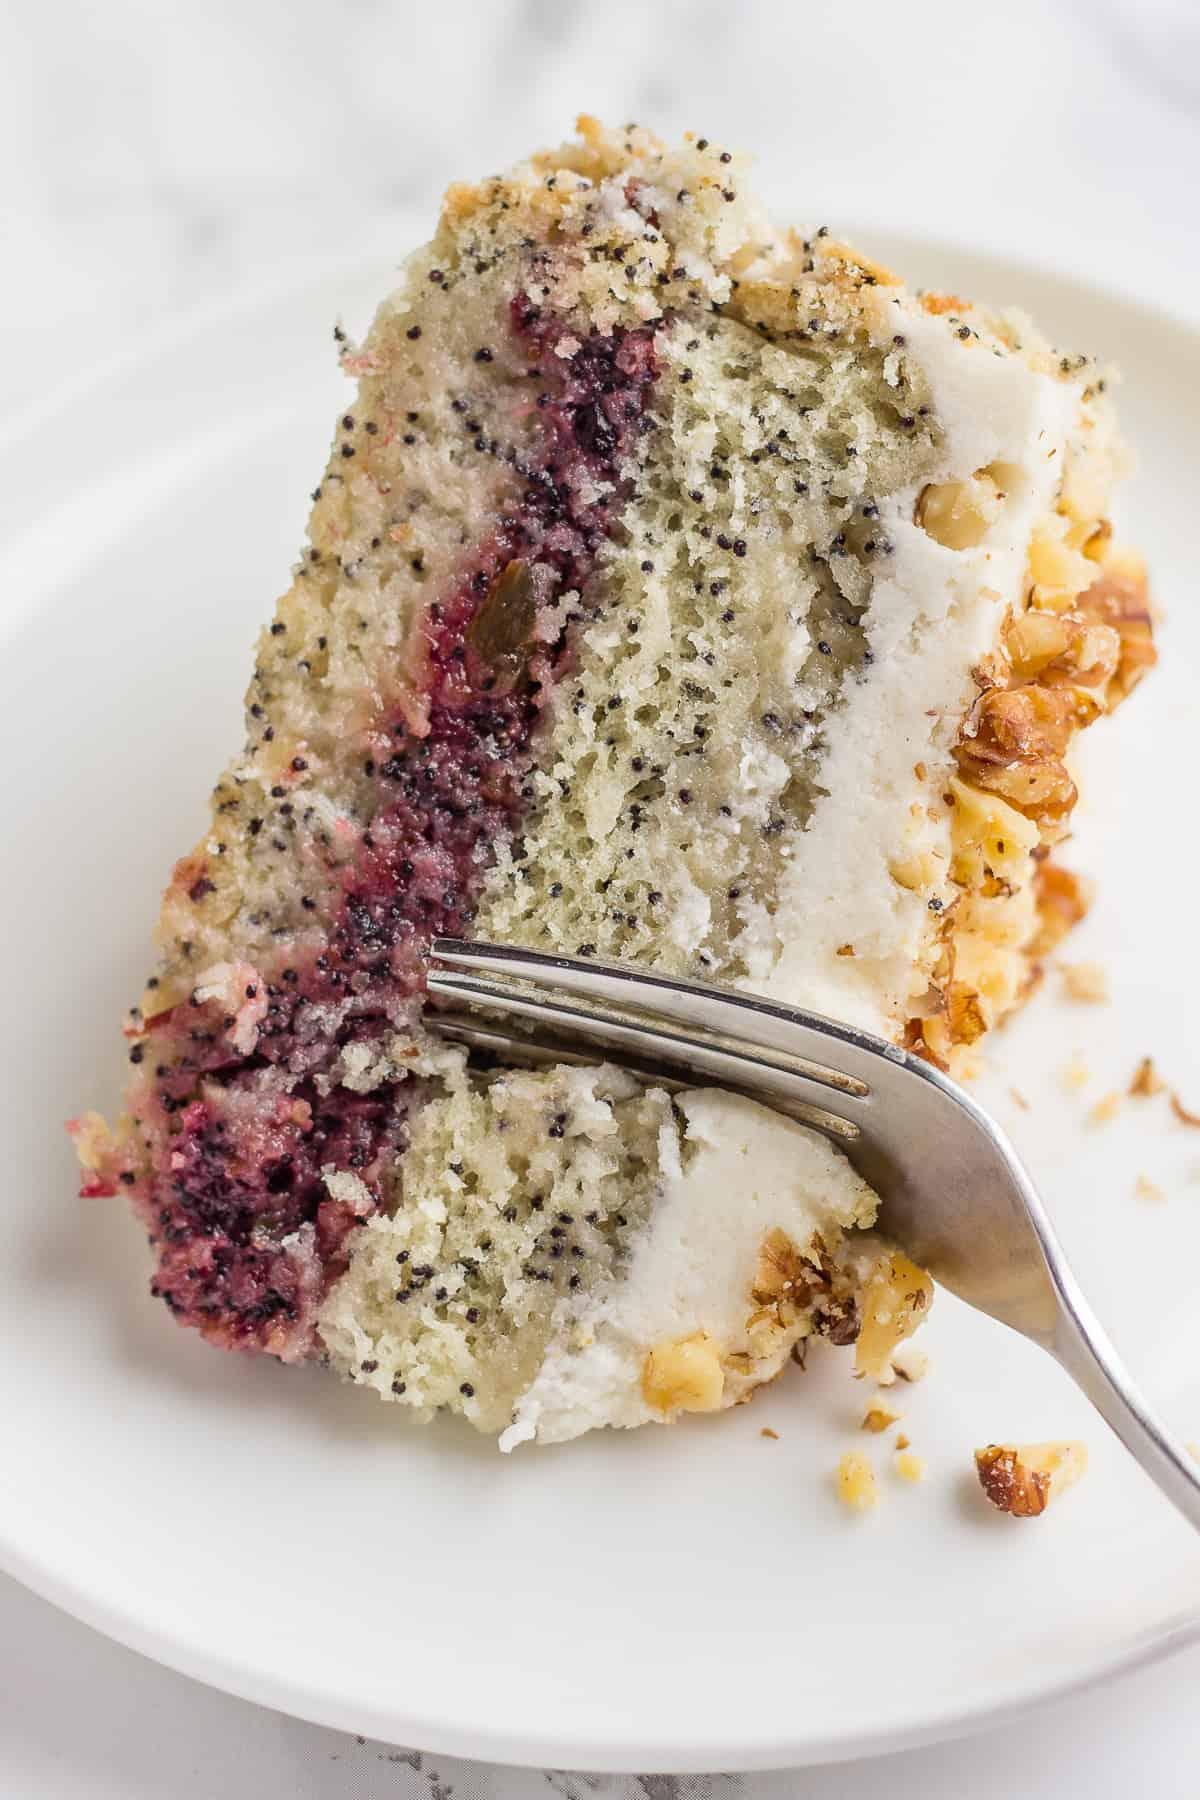 Slice of Vegan Poppy Seed Cake